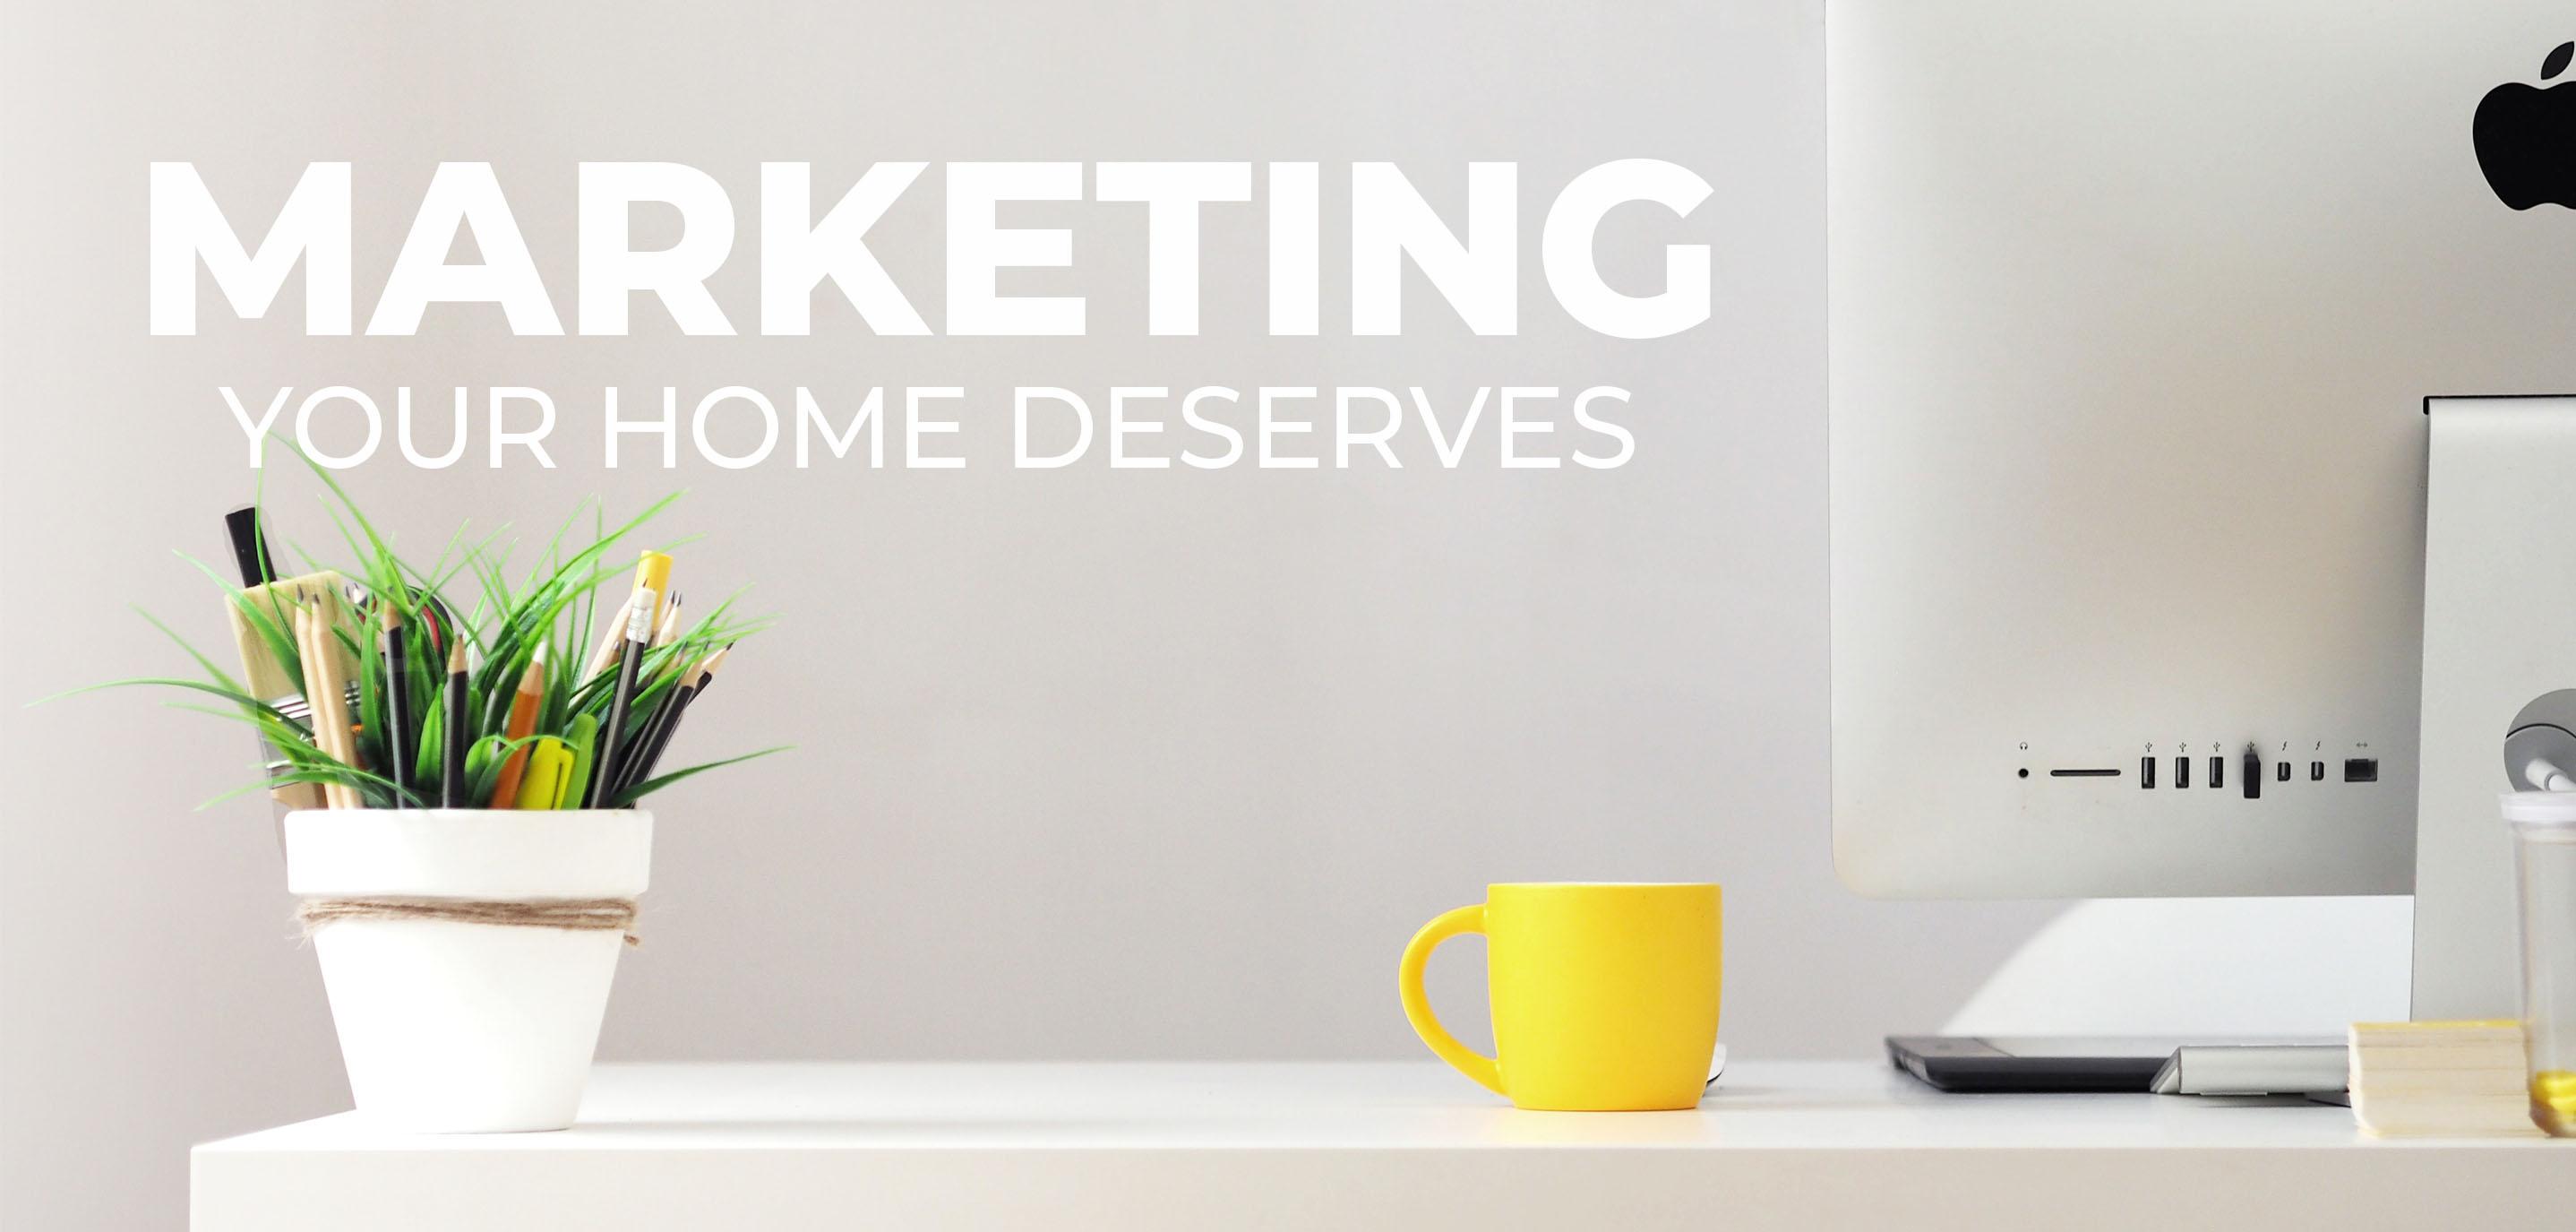 Marketing Your Home Deserves